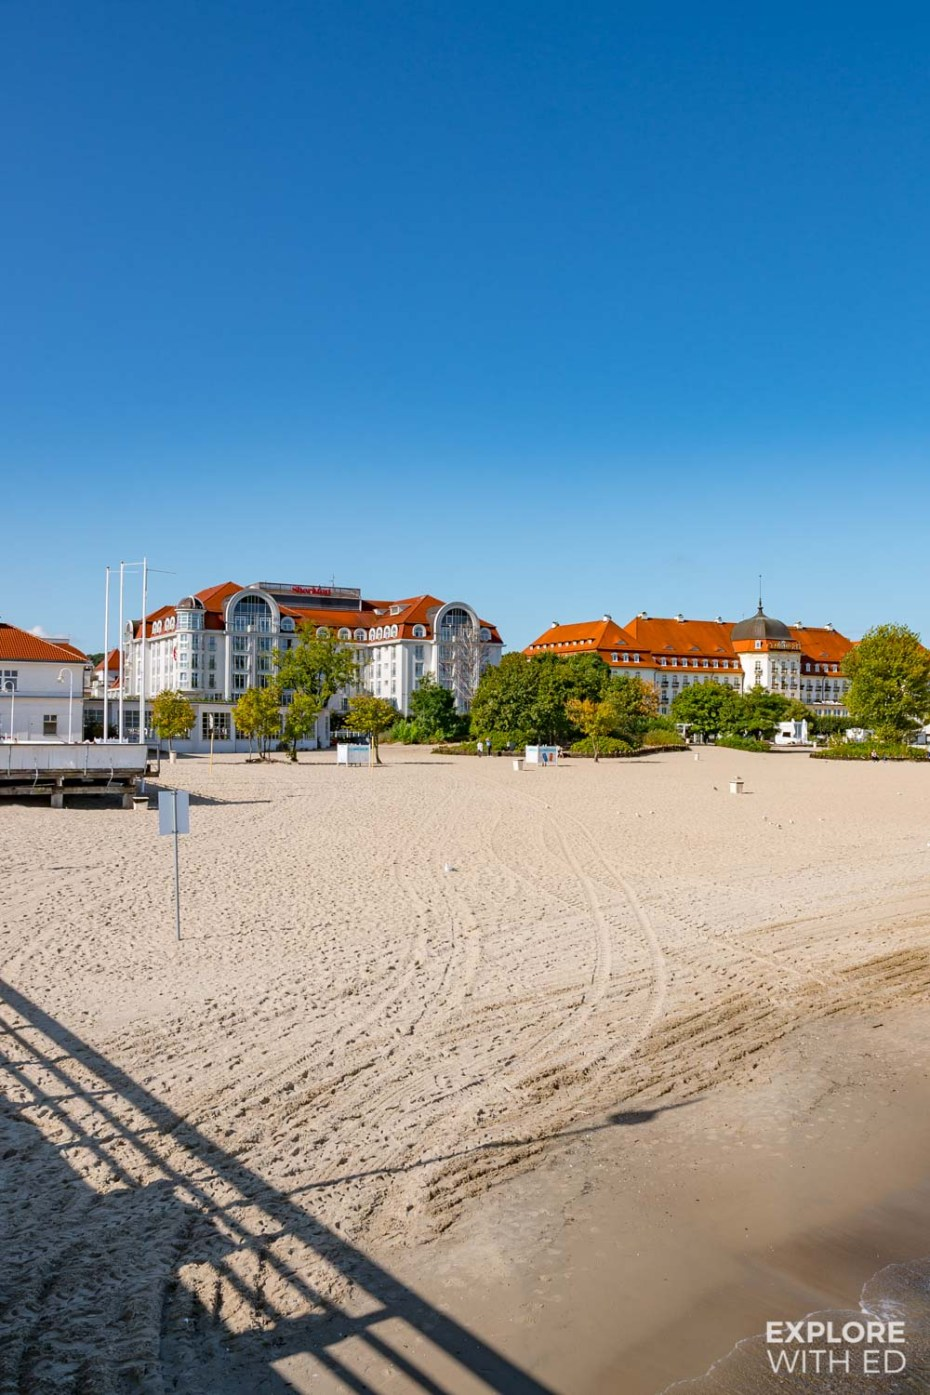 The Sheraton and Sofitel Grand Sopot Hotel on the beach